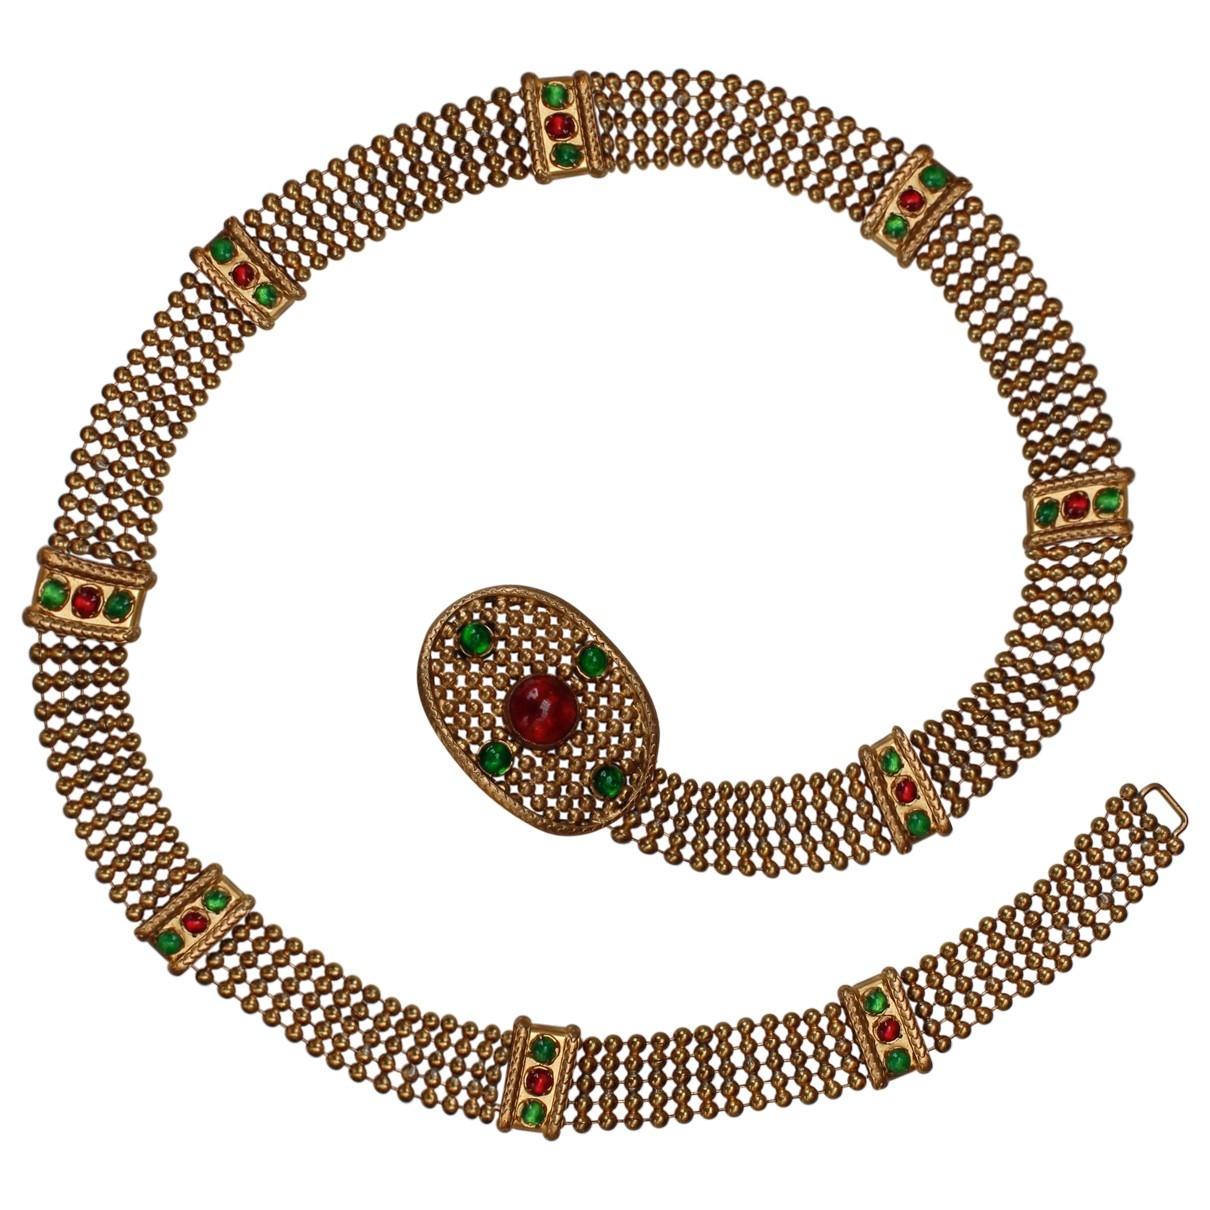 Cinturon Chanel